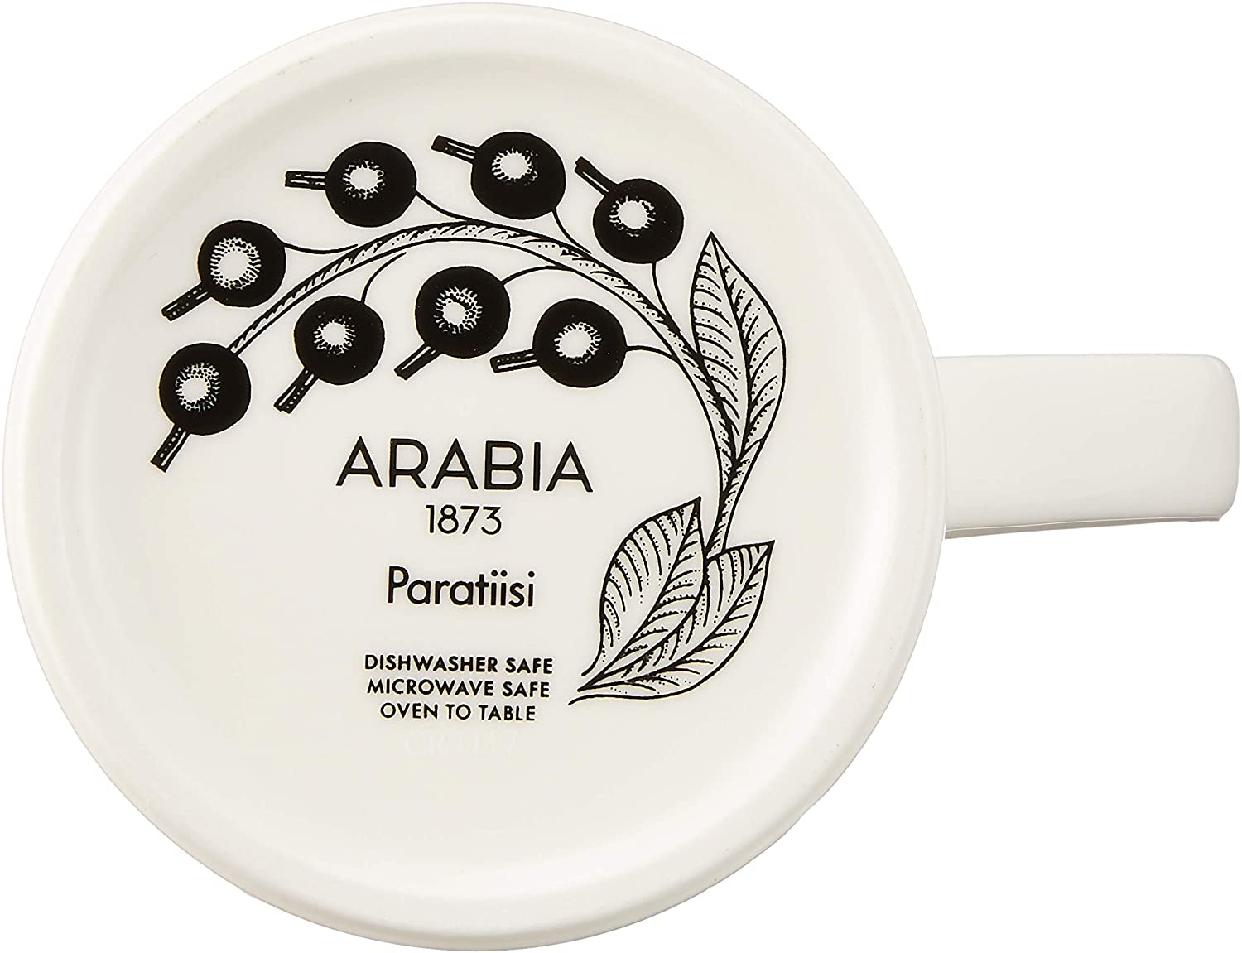 ARABIA(アラビア) パラティッシ ブラック マグの商品画像4